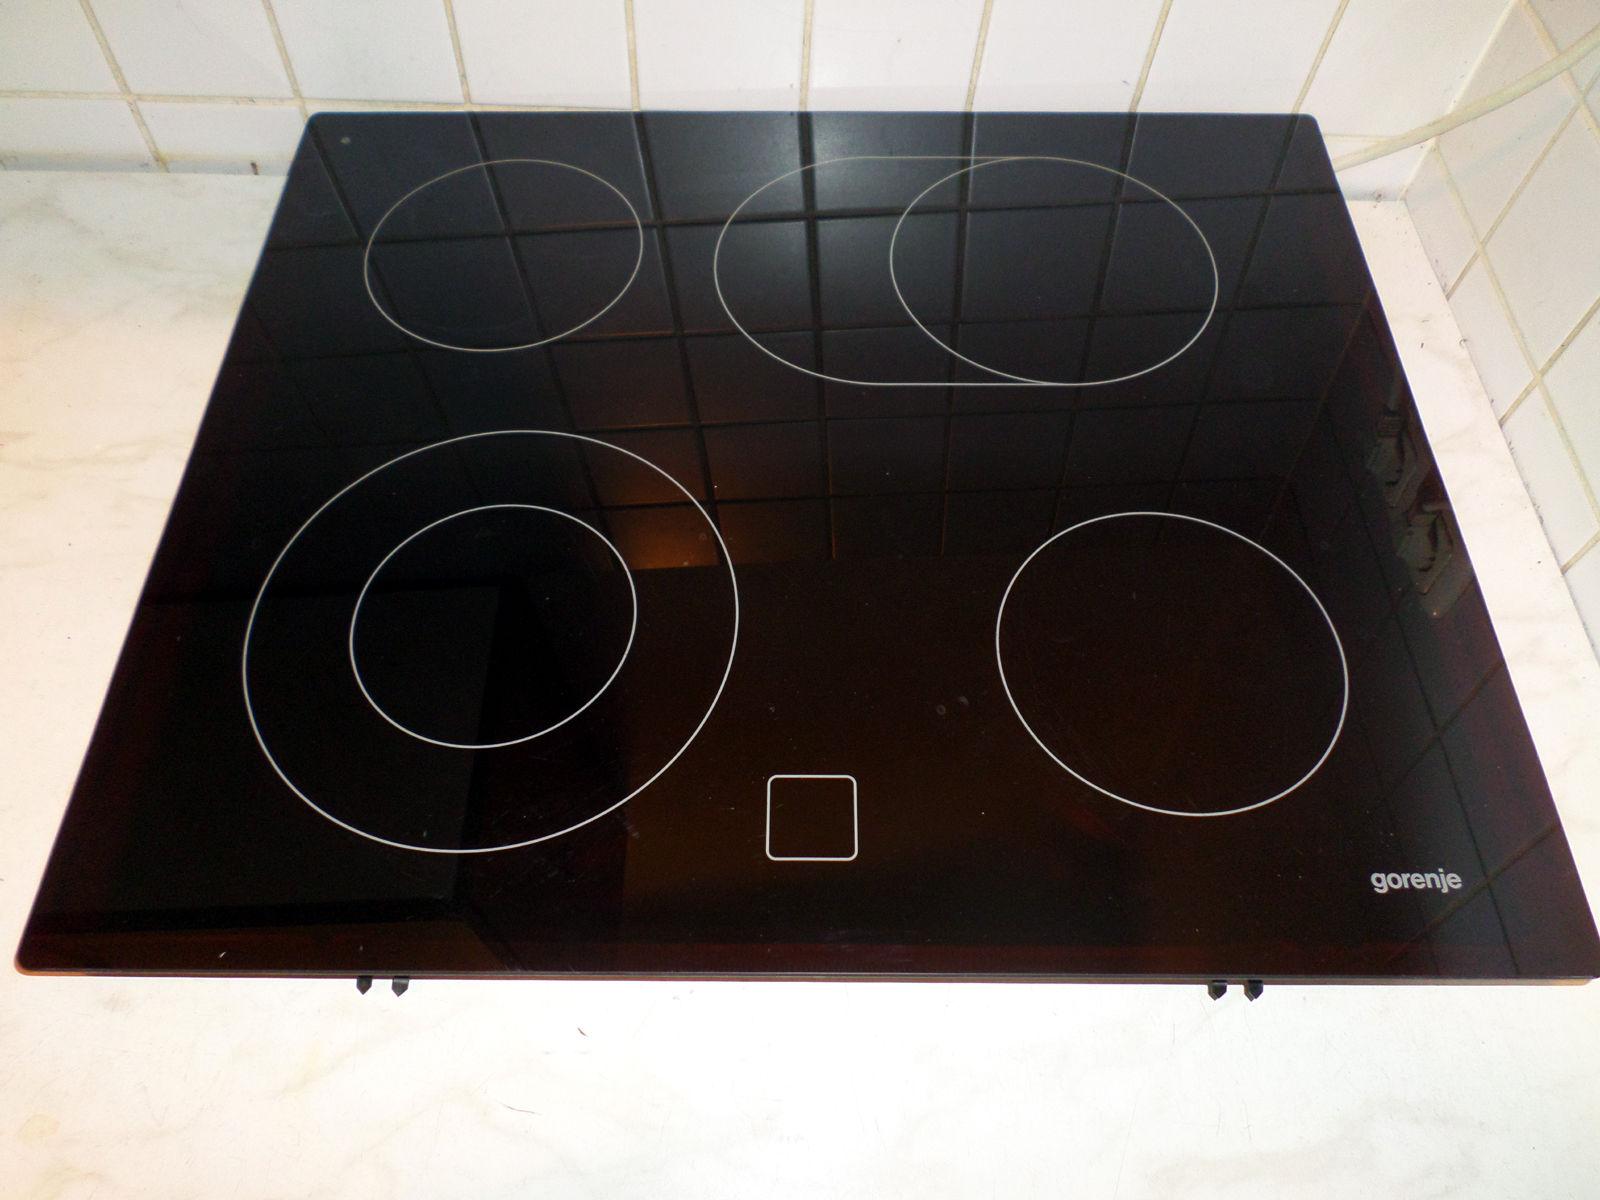 gorenje skp 631s ecd620esc glaskeramik kochfeld hilight. Black Bedroom Furniture Sets. Home Design Ideas